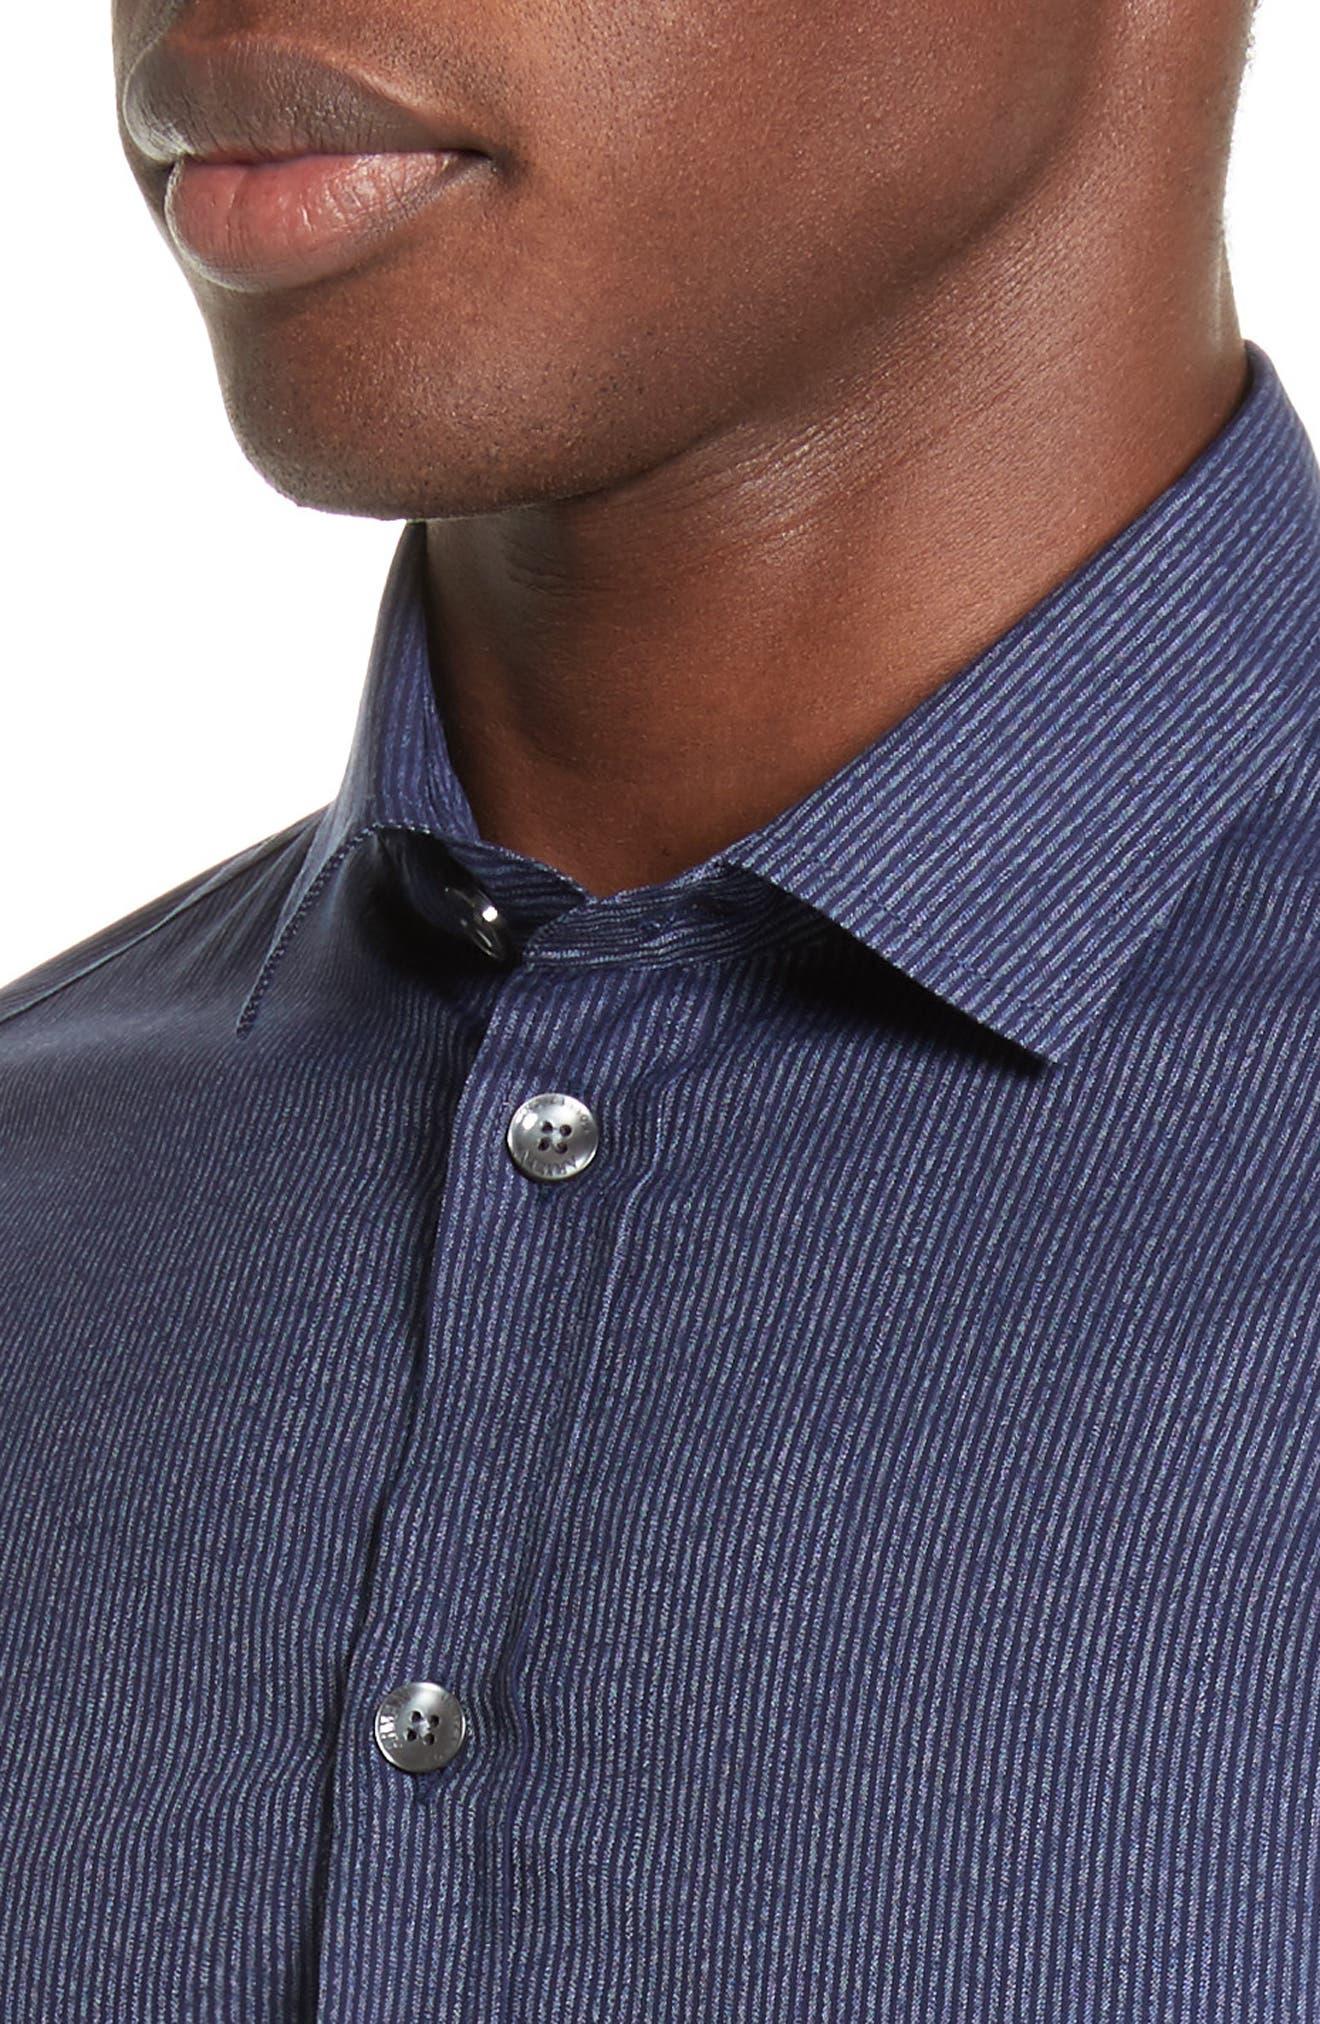 Regular Fit Pinstripe Sport Shirt,                             Alternate thumbnail 4, color,                             471